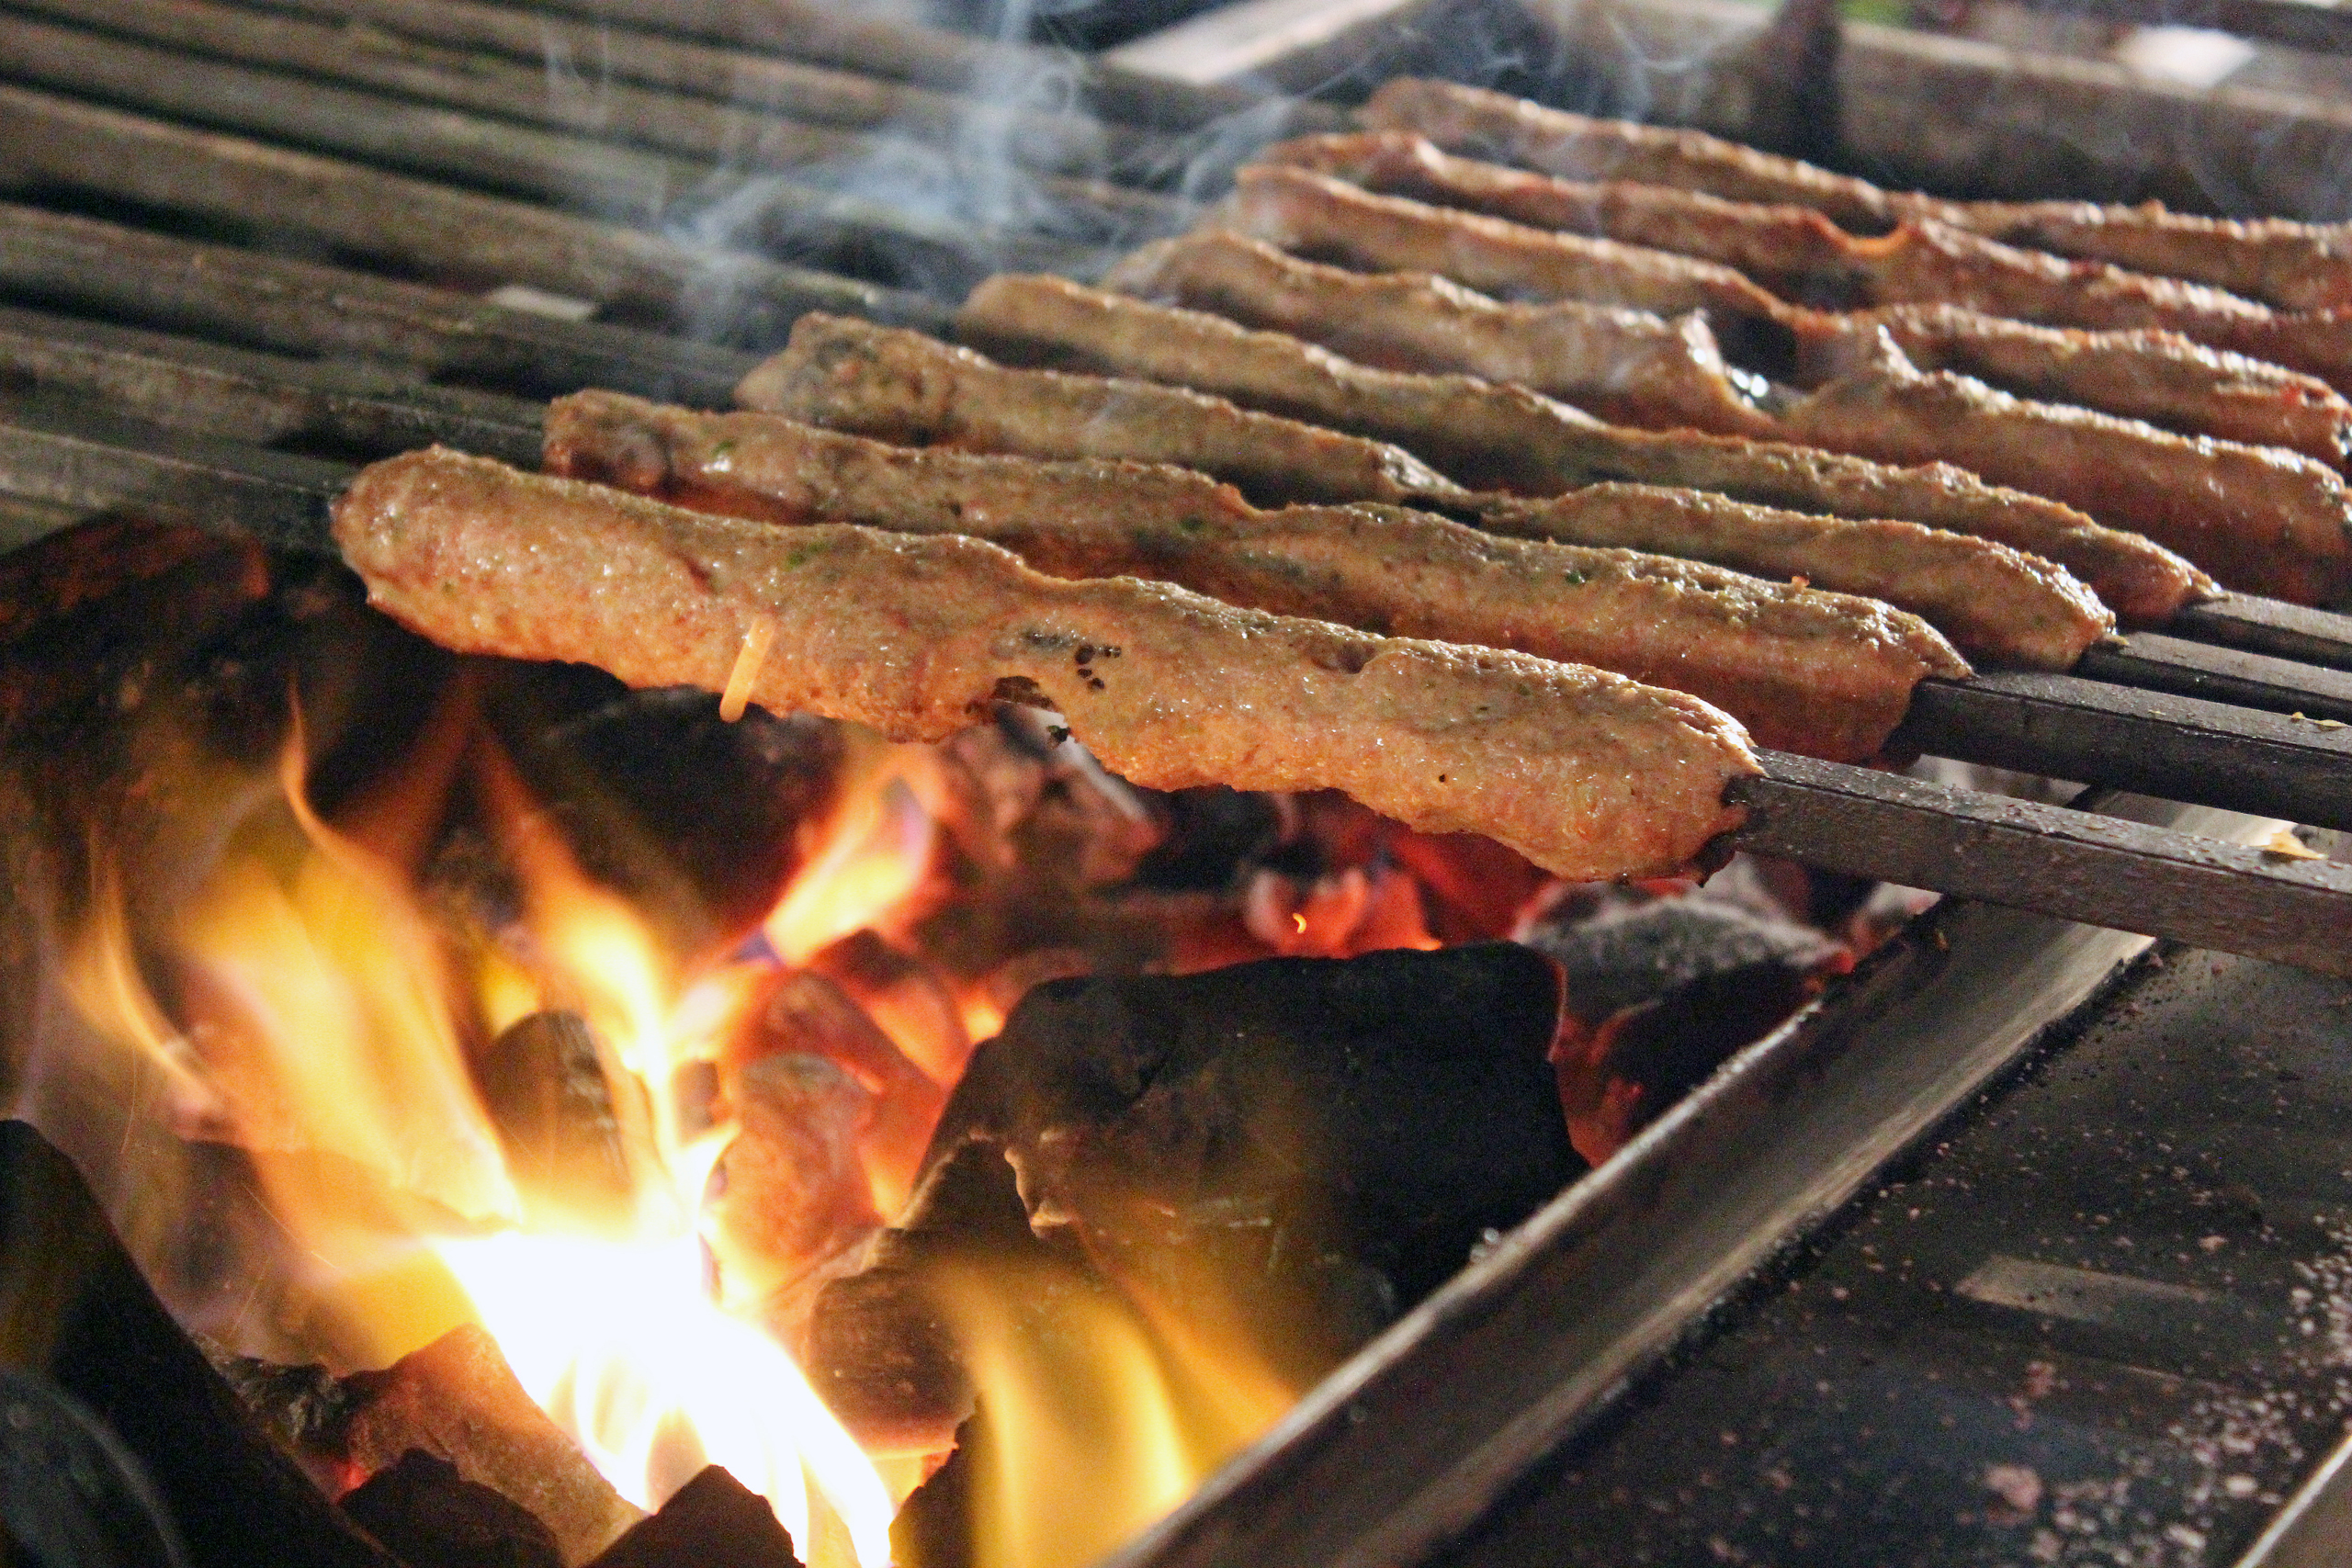 Sheekh kabab on charcoal grill